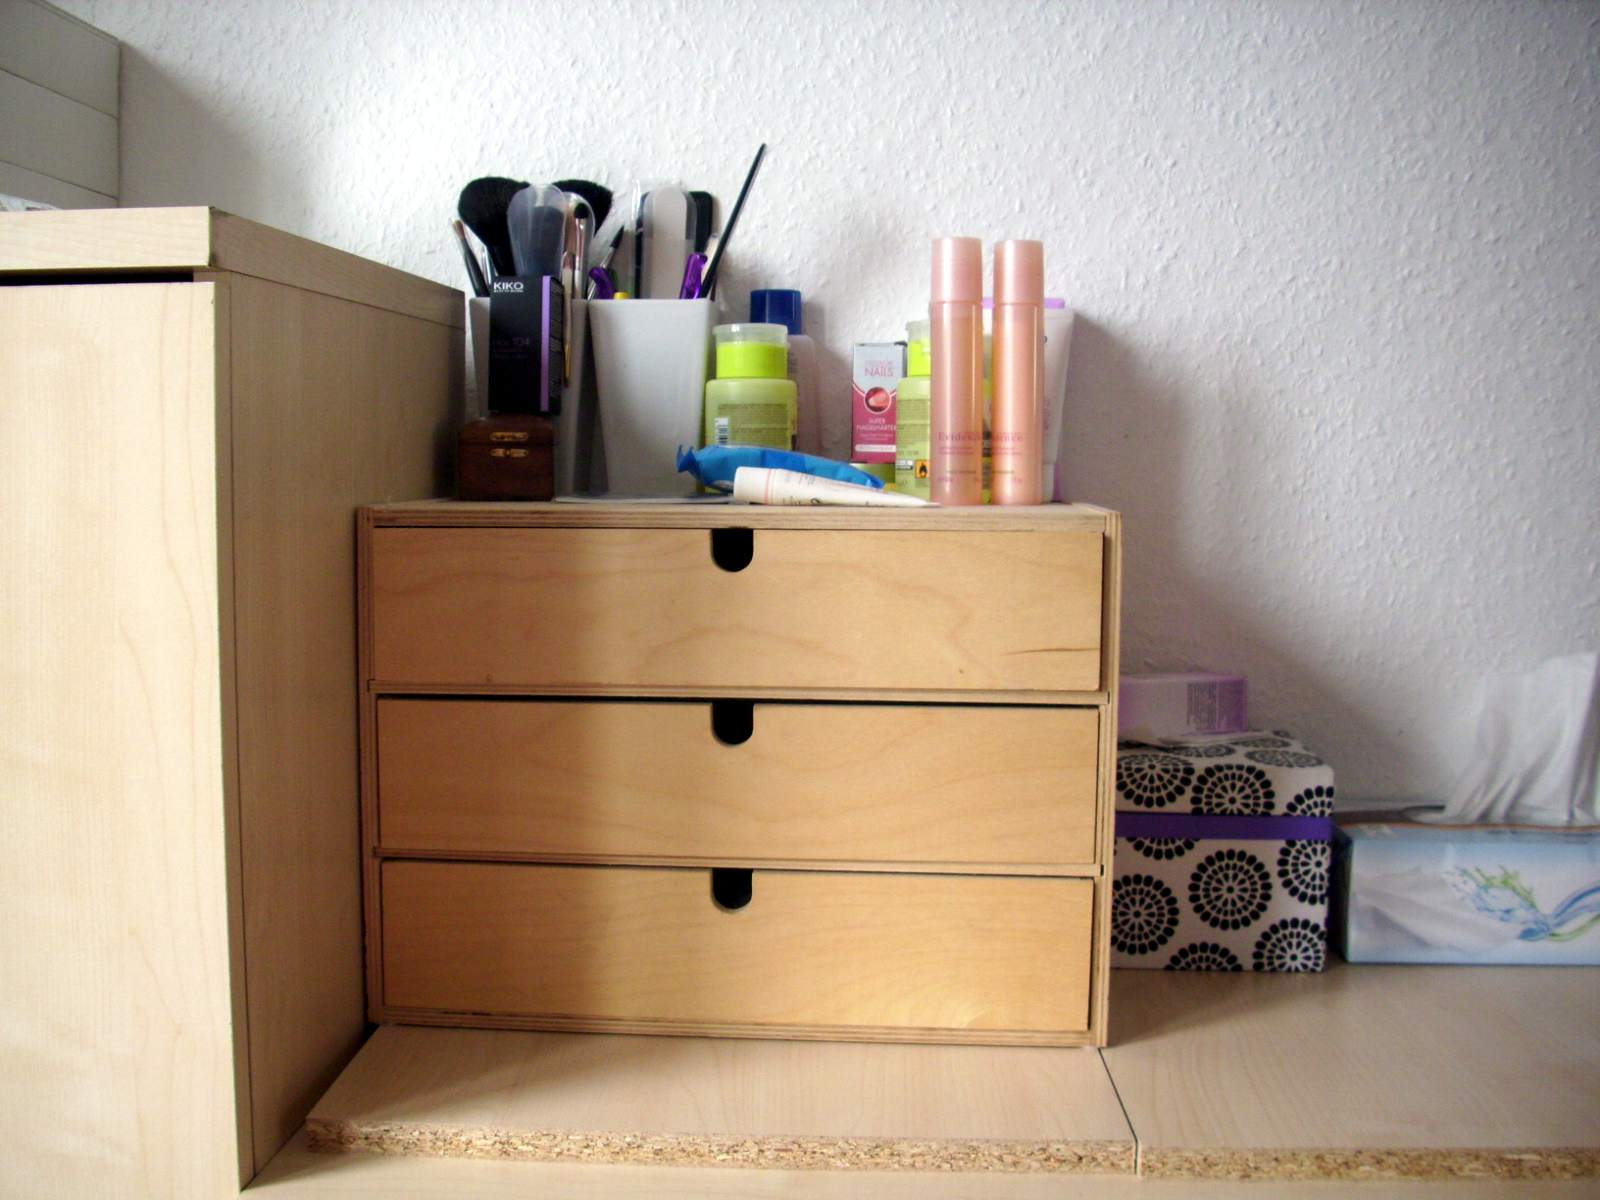 lina 39 s fairy tale kosmetik aufbewahrung. Black Bedroom Furniture Sets. Home Design Ideas